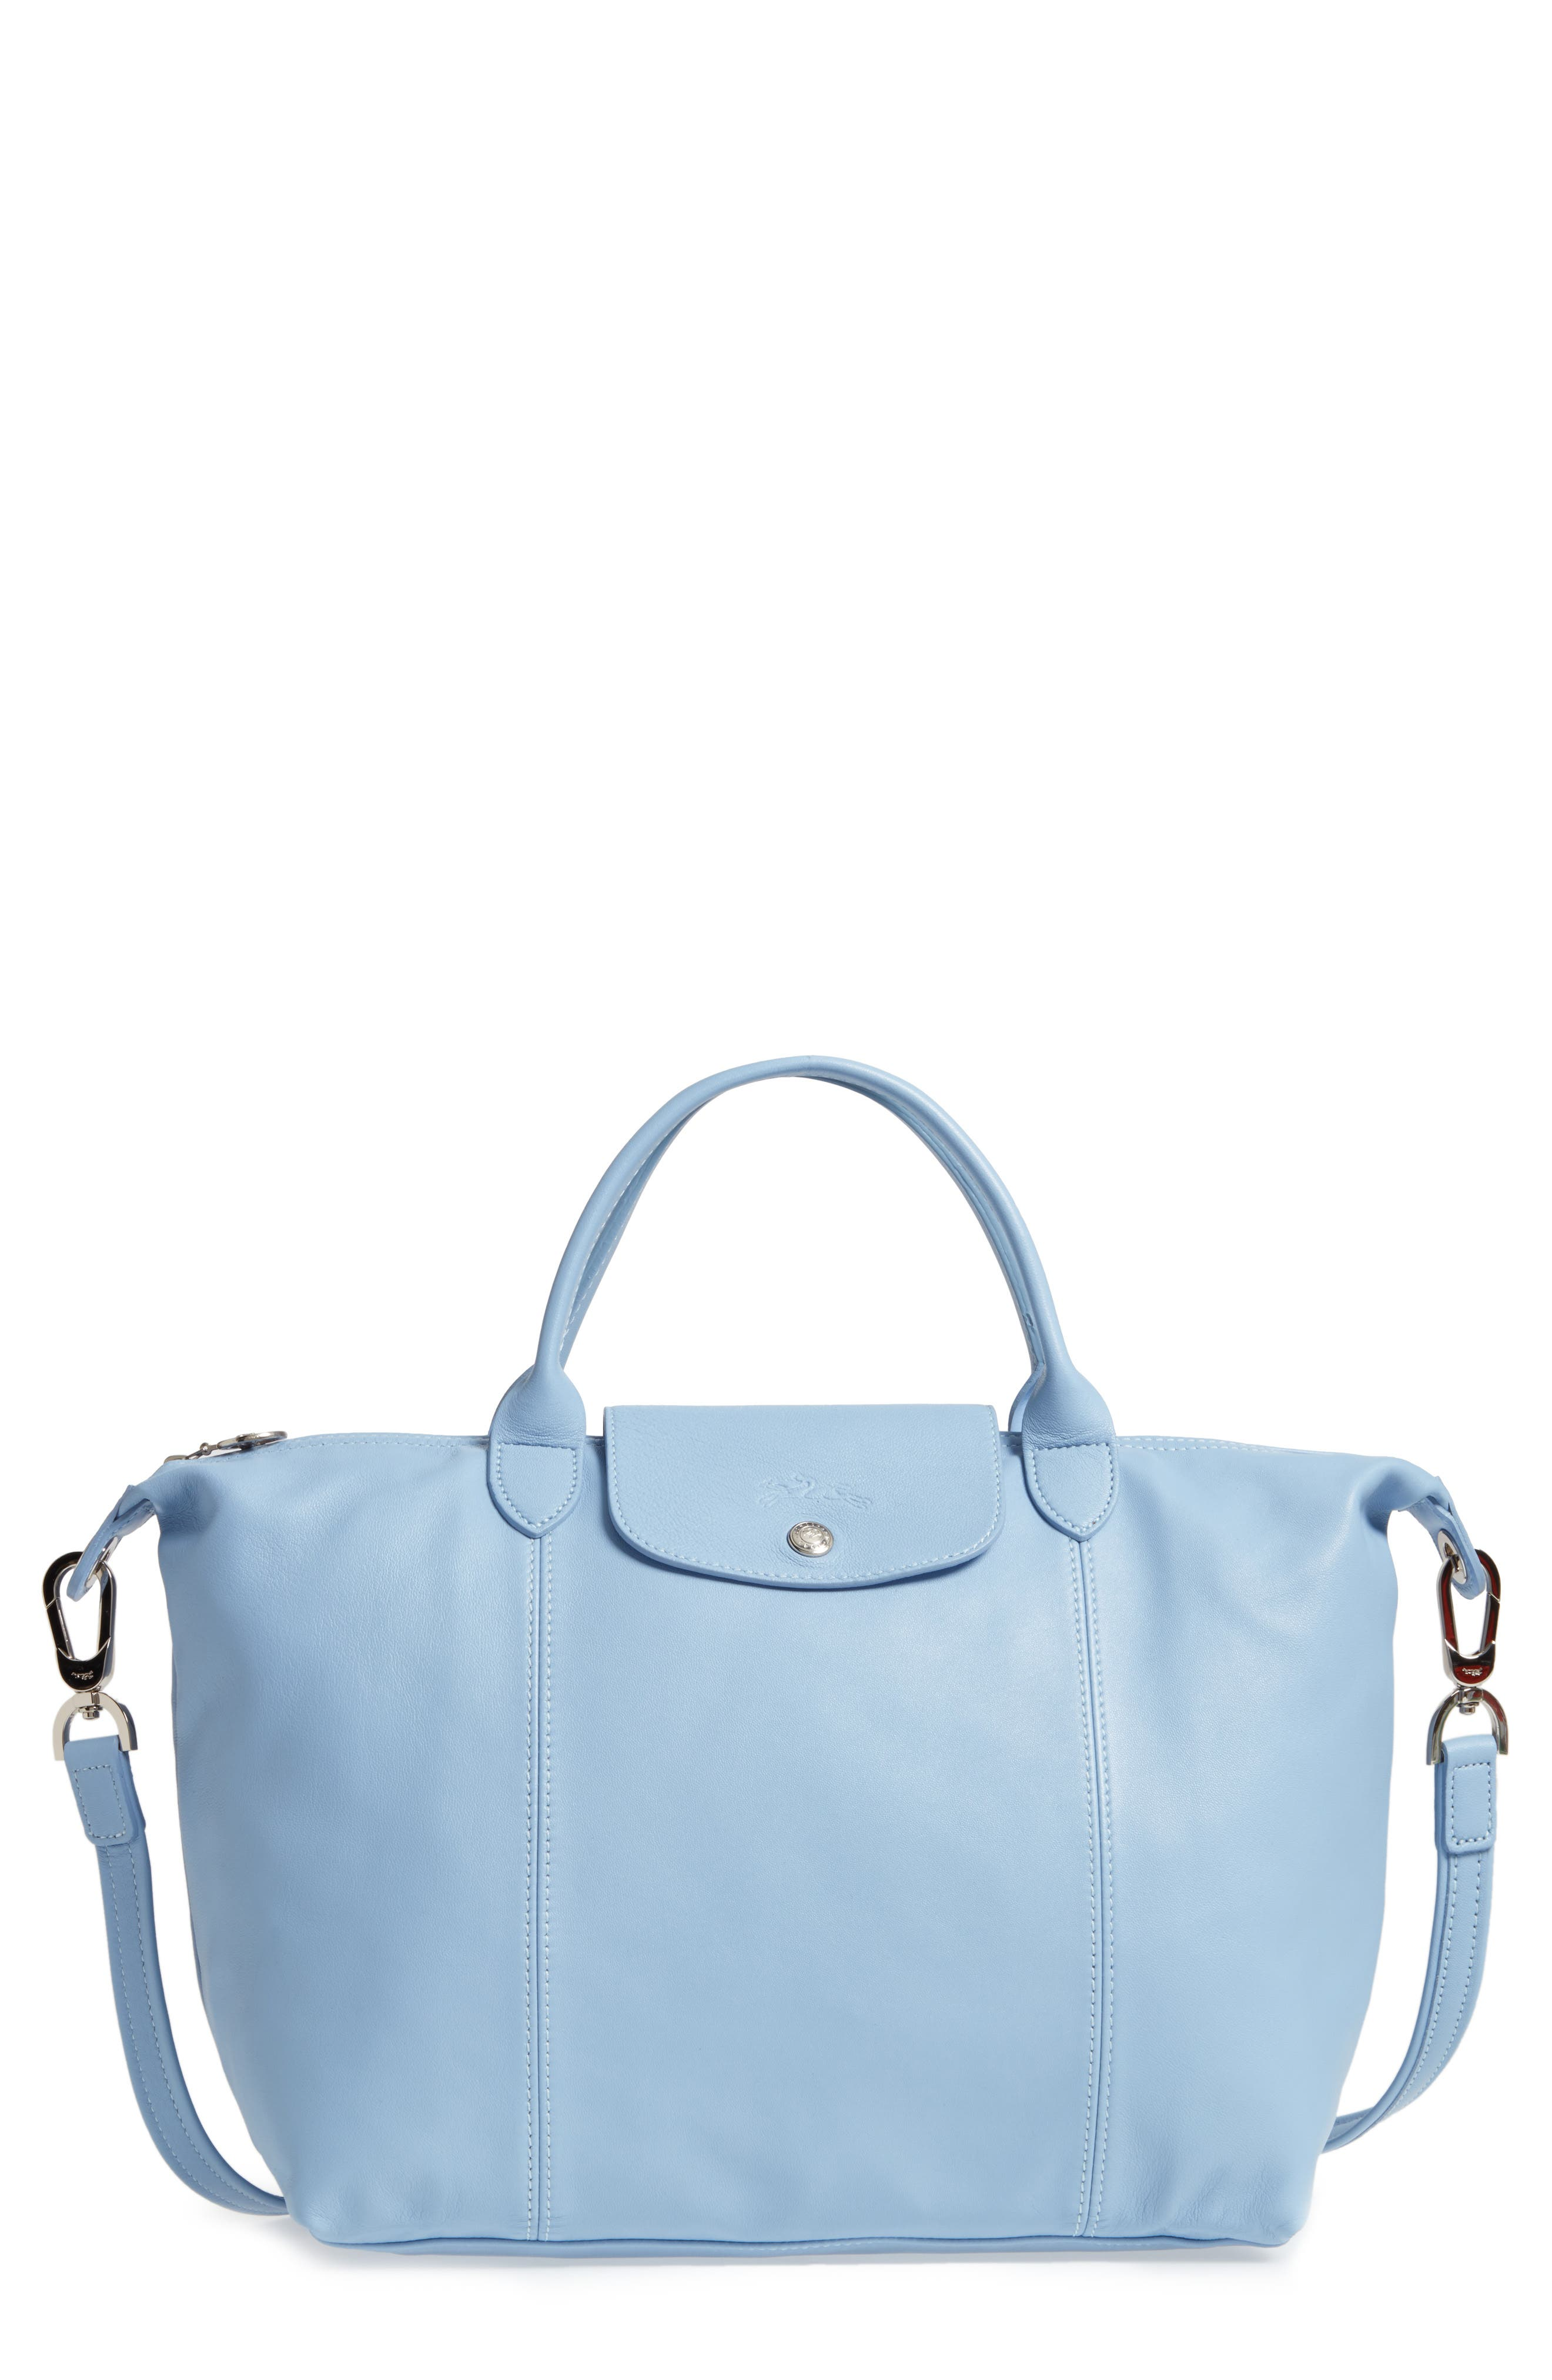 Longchamp 'Le Pliage Cuir' Leather Handbag